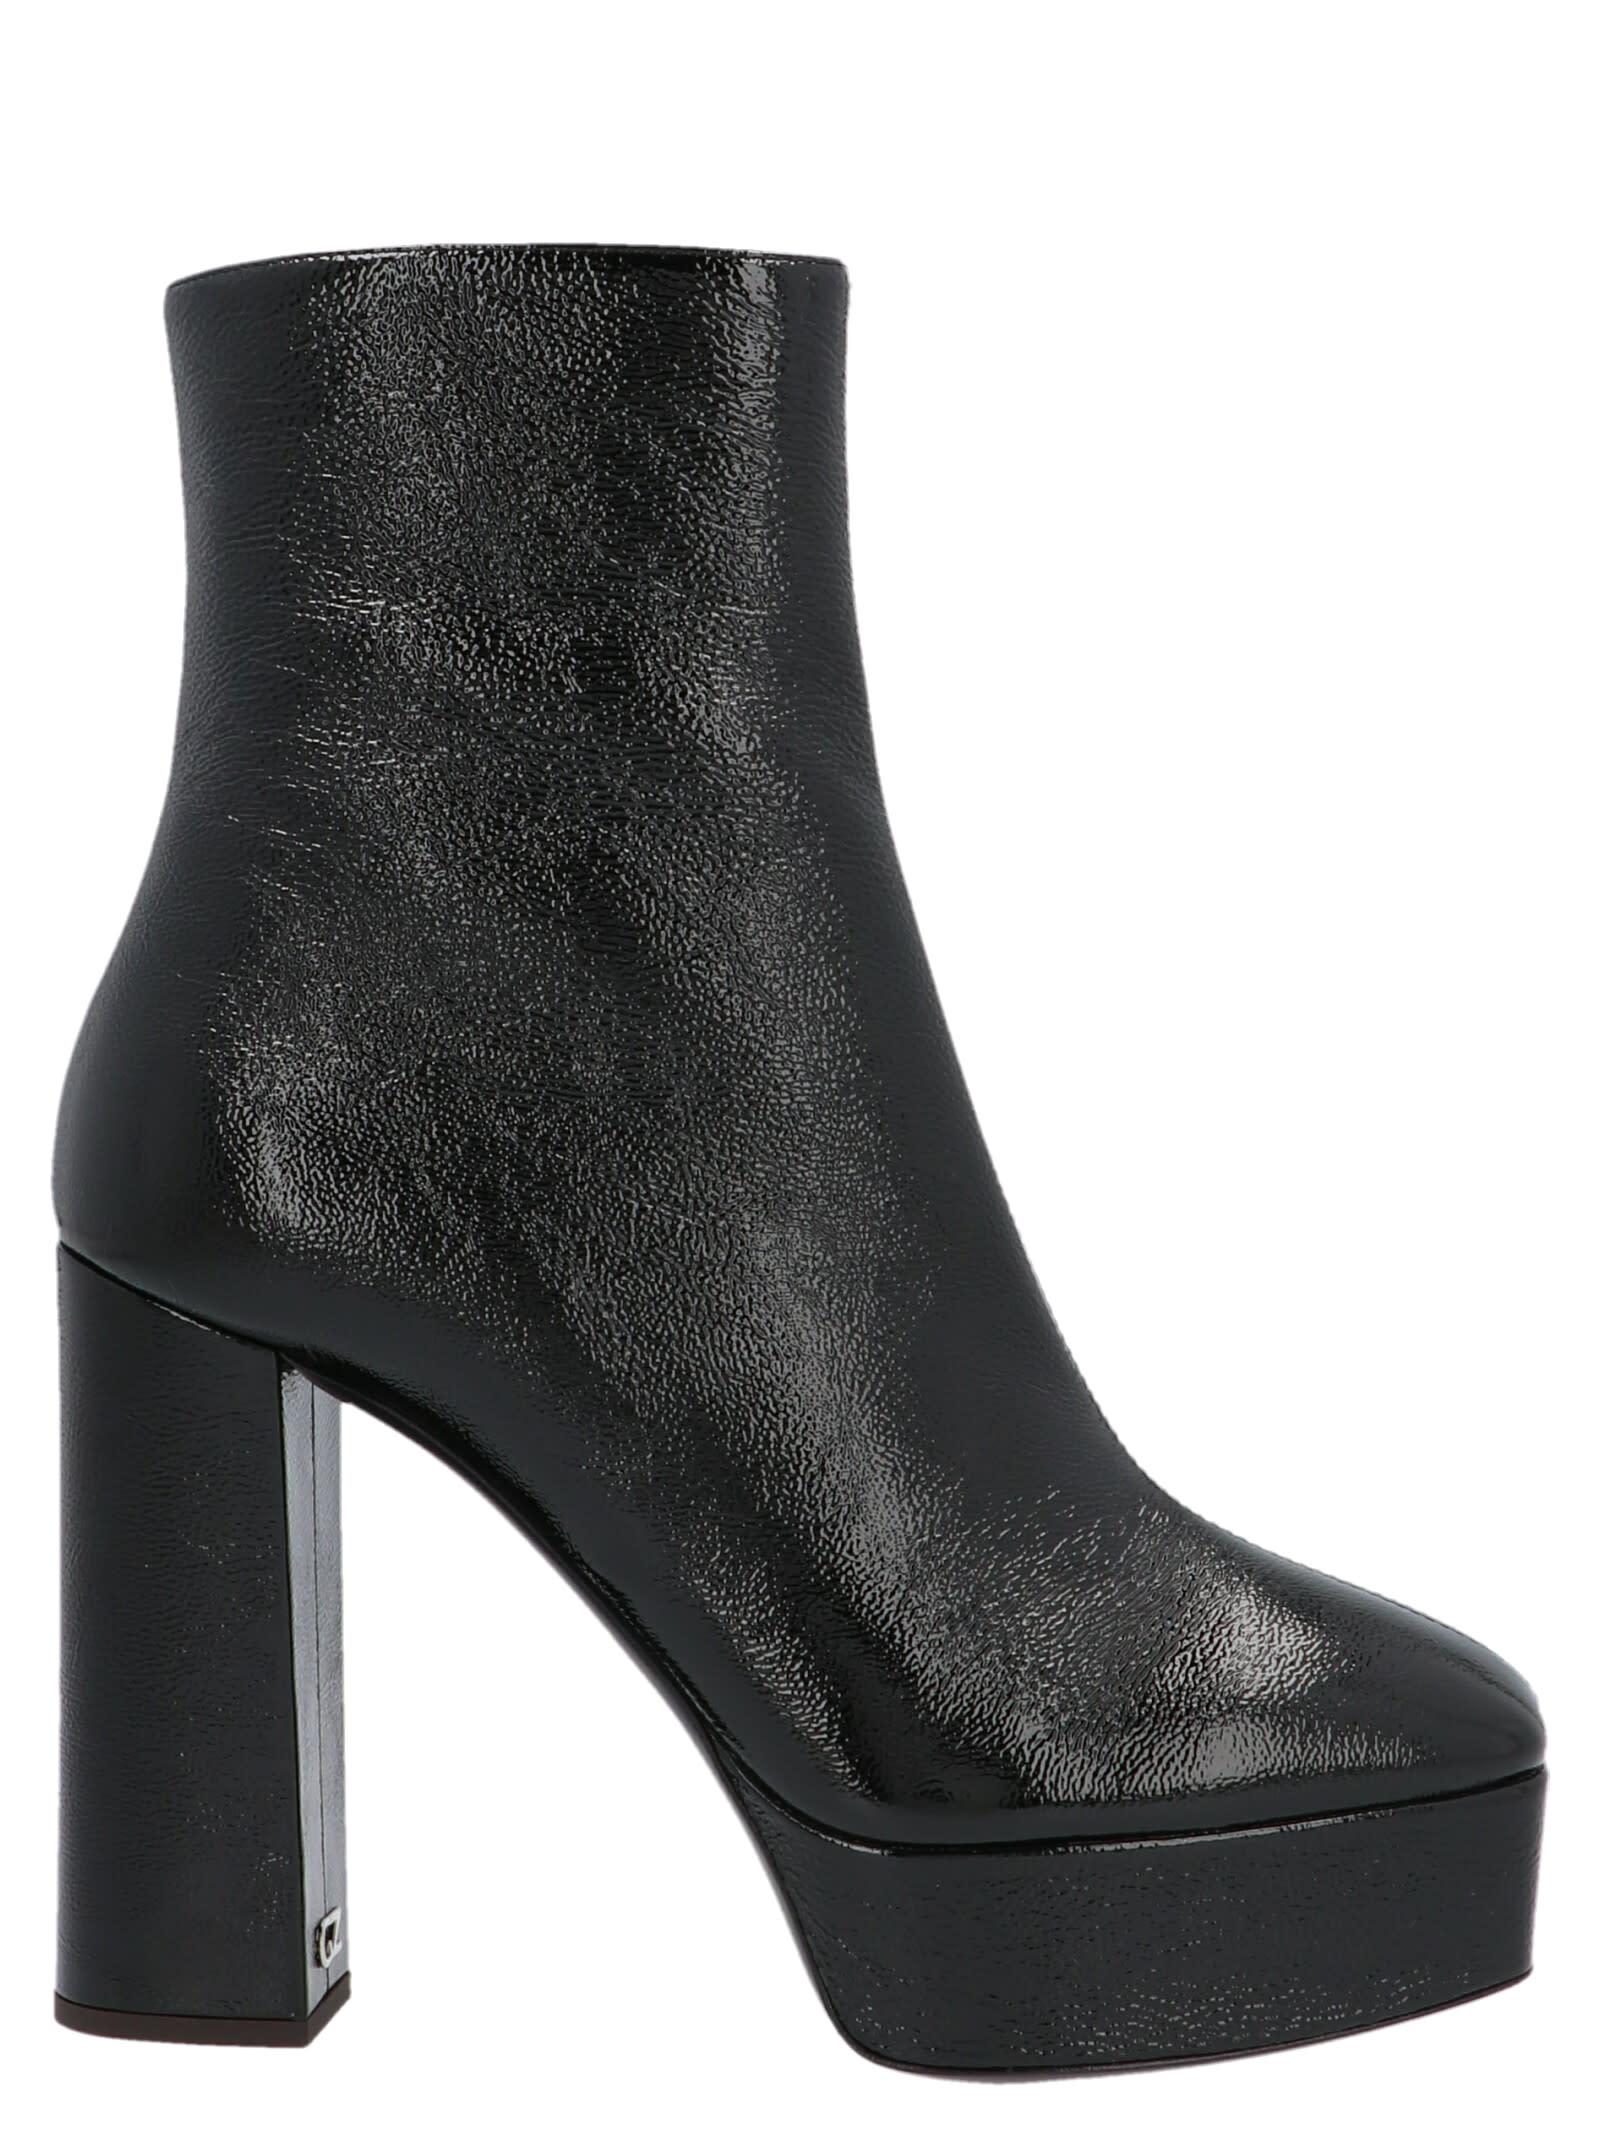 Giuseppe Zanotti new York 120 Shoes